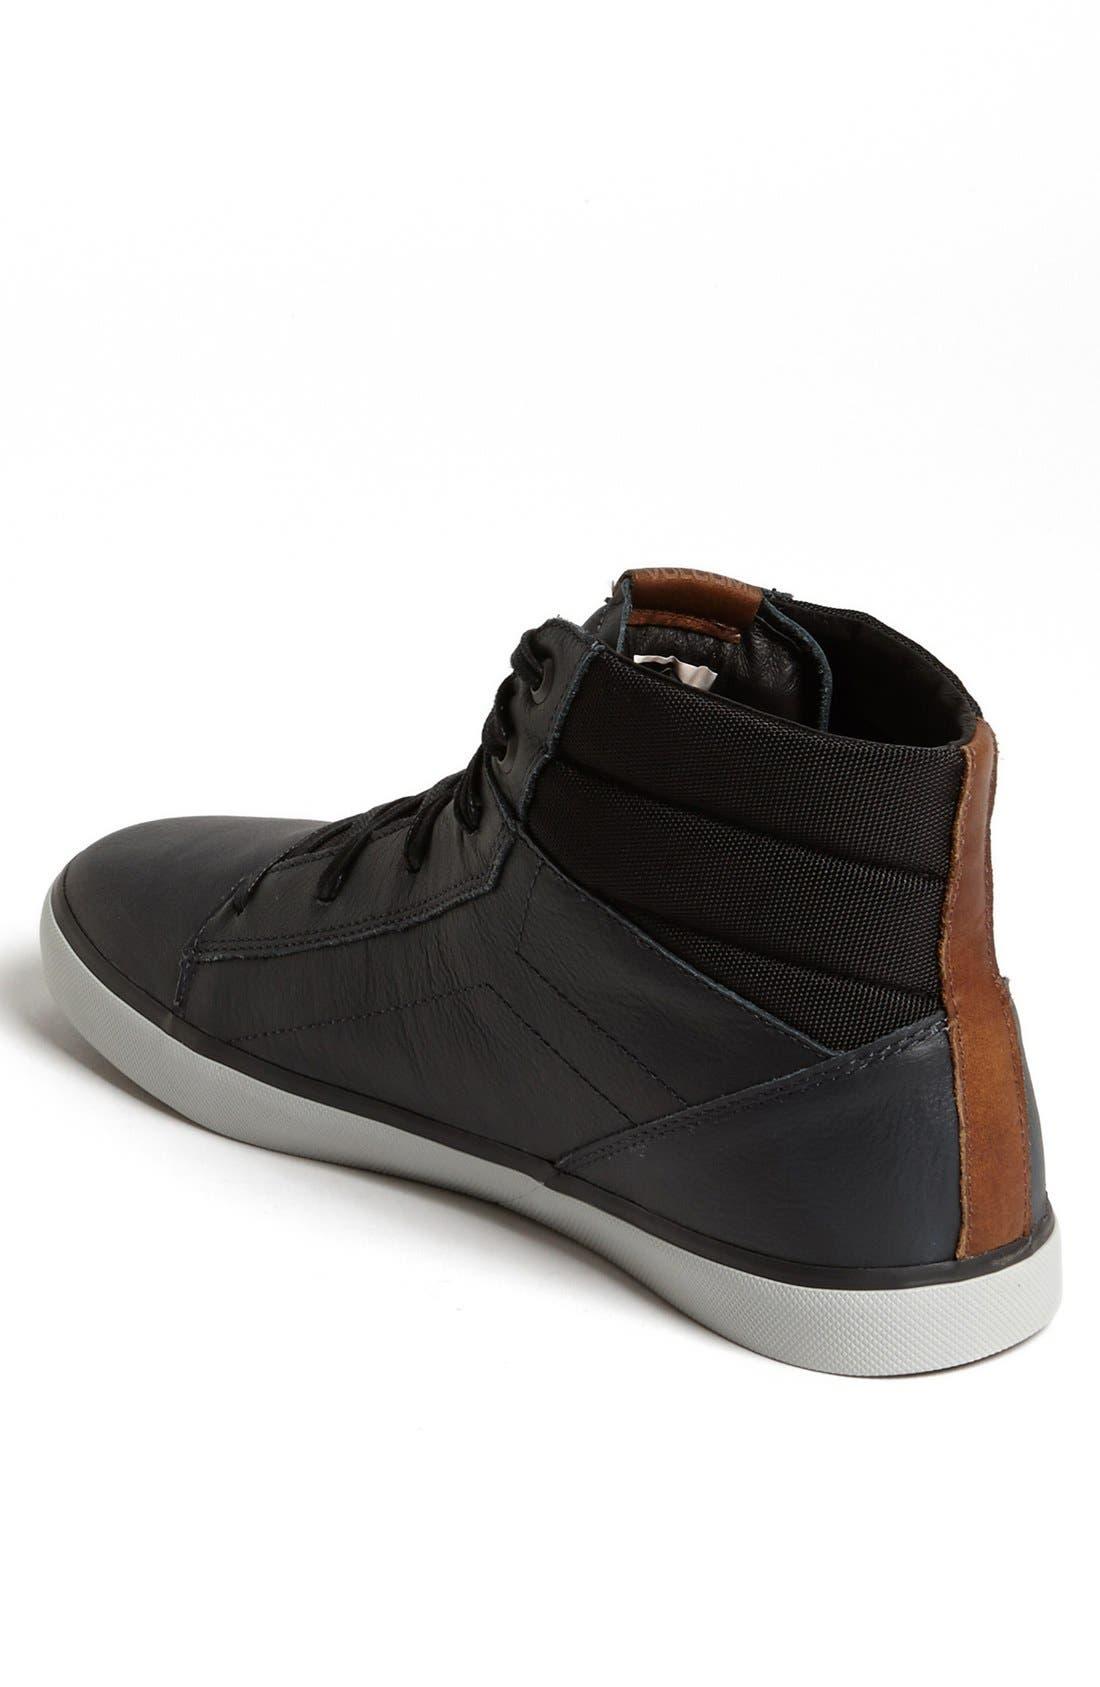 Alternate Image 2  - Volcom 'Grimm' High Top Sneaker